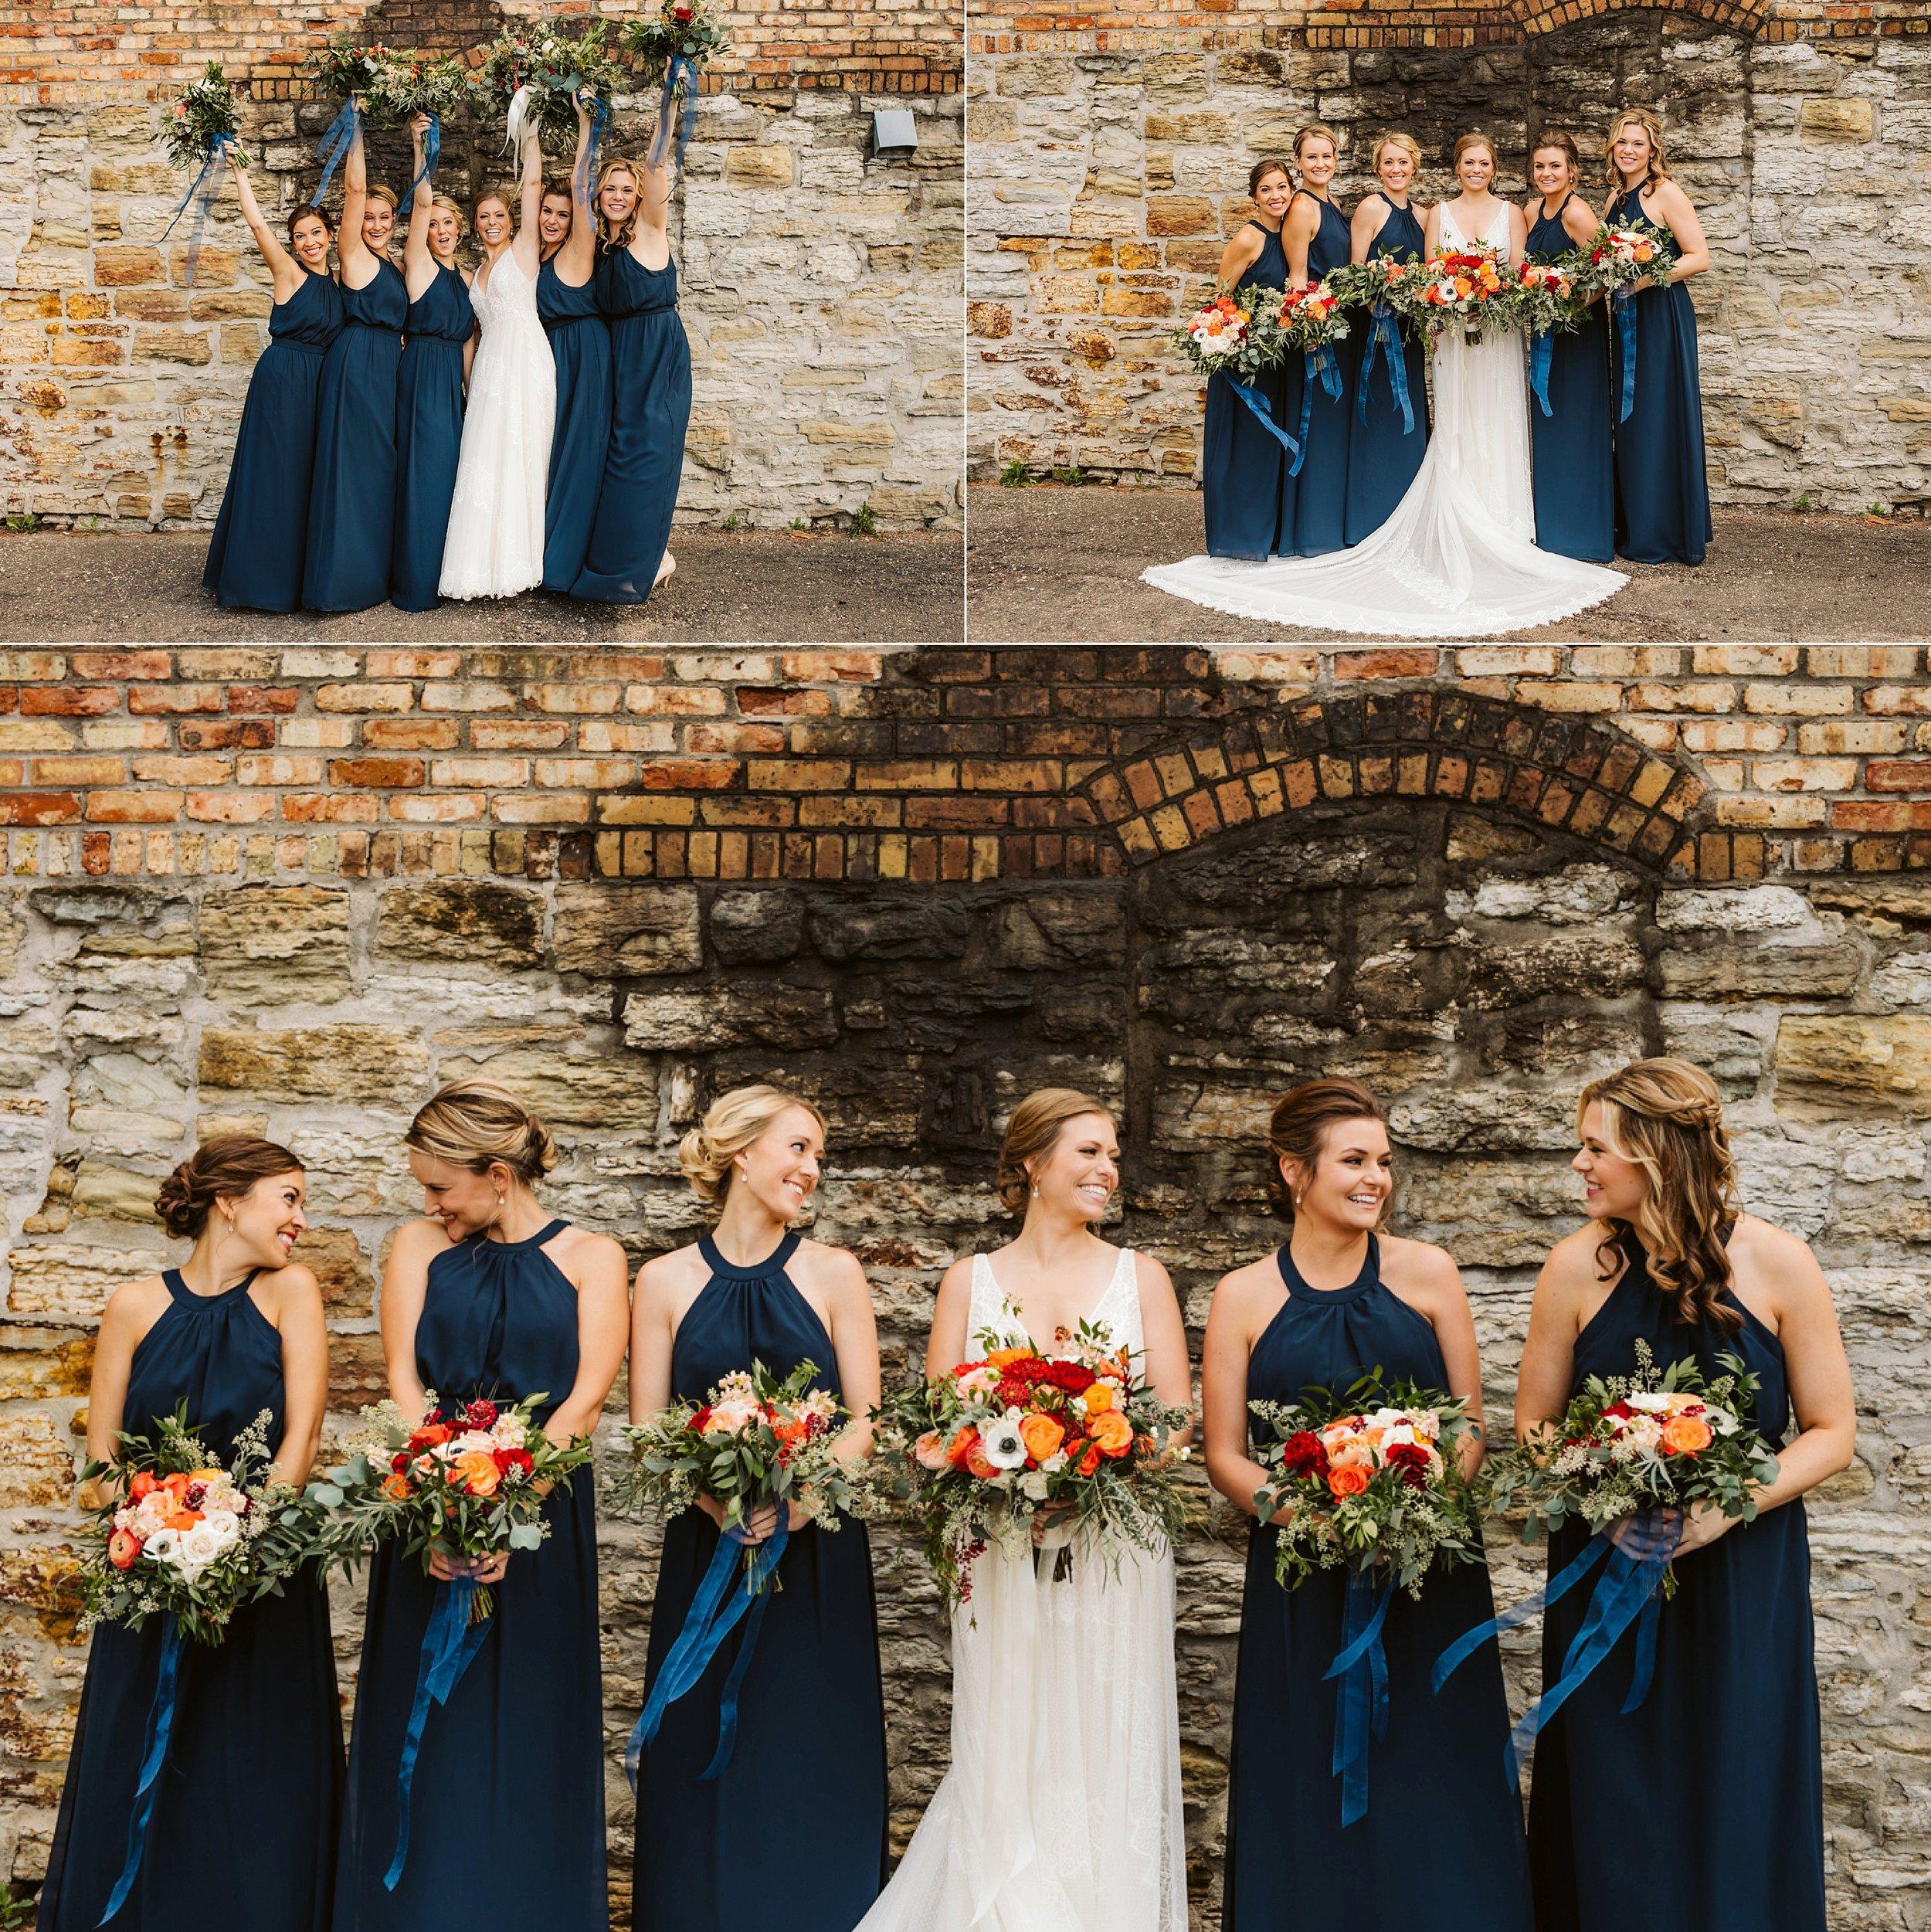 Nicollet-Island-Pavilion-Minneapolis-September-Coral-Navy-Wedding-92.jpg